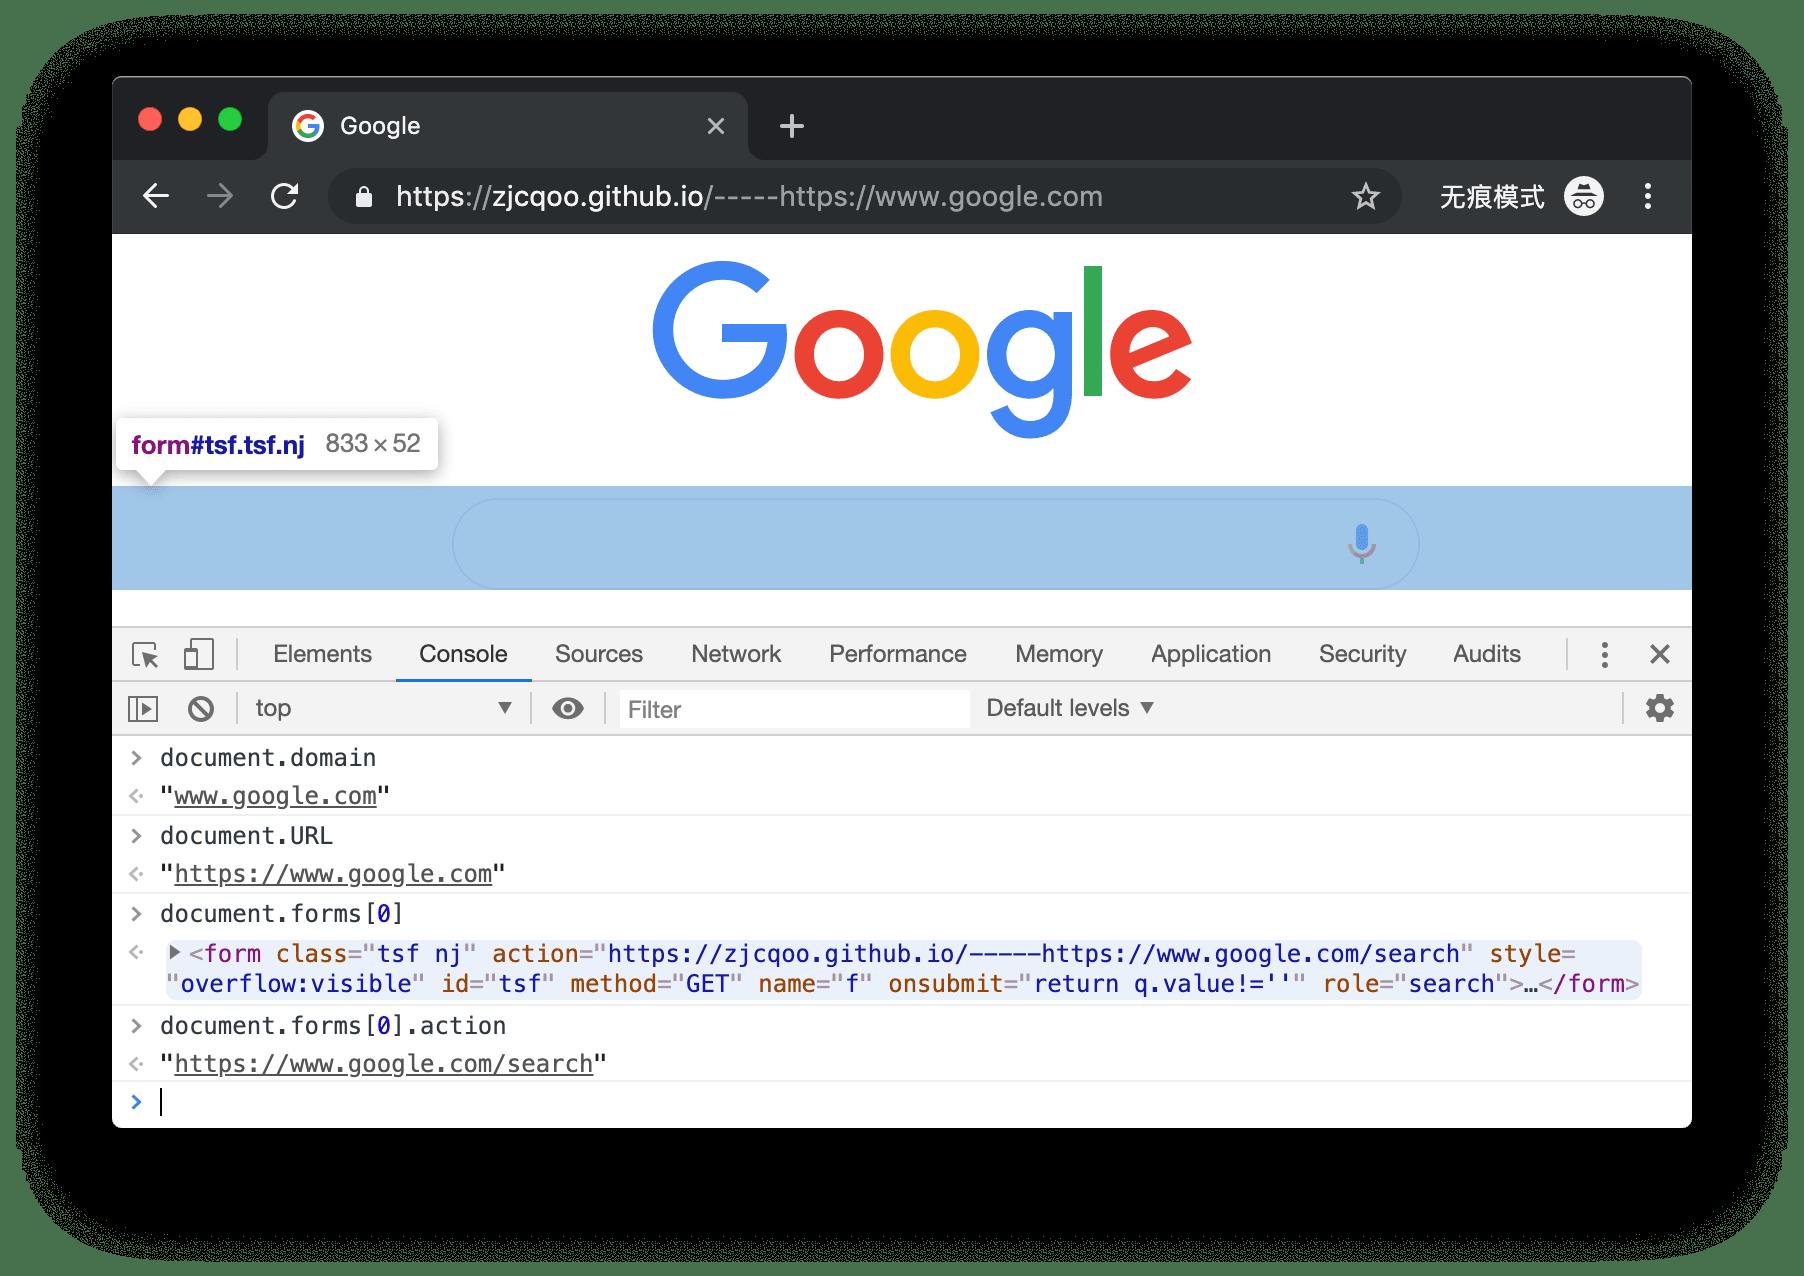 jsproxy 一个基于浏览器端 JS 实现的在线代理